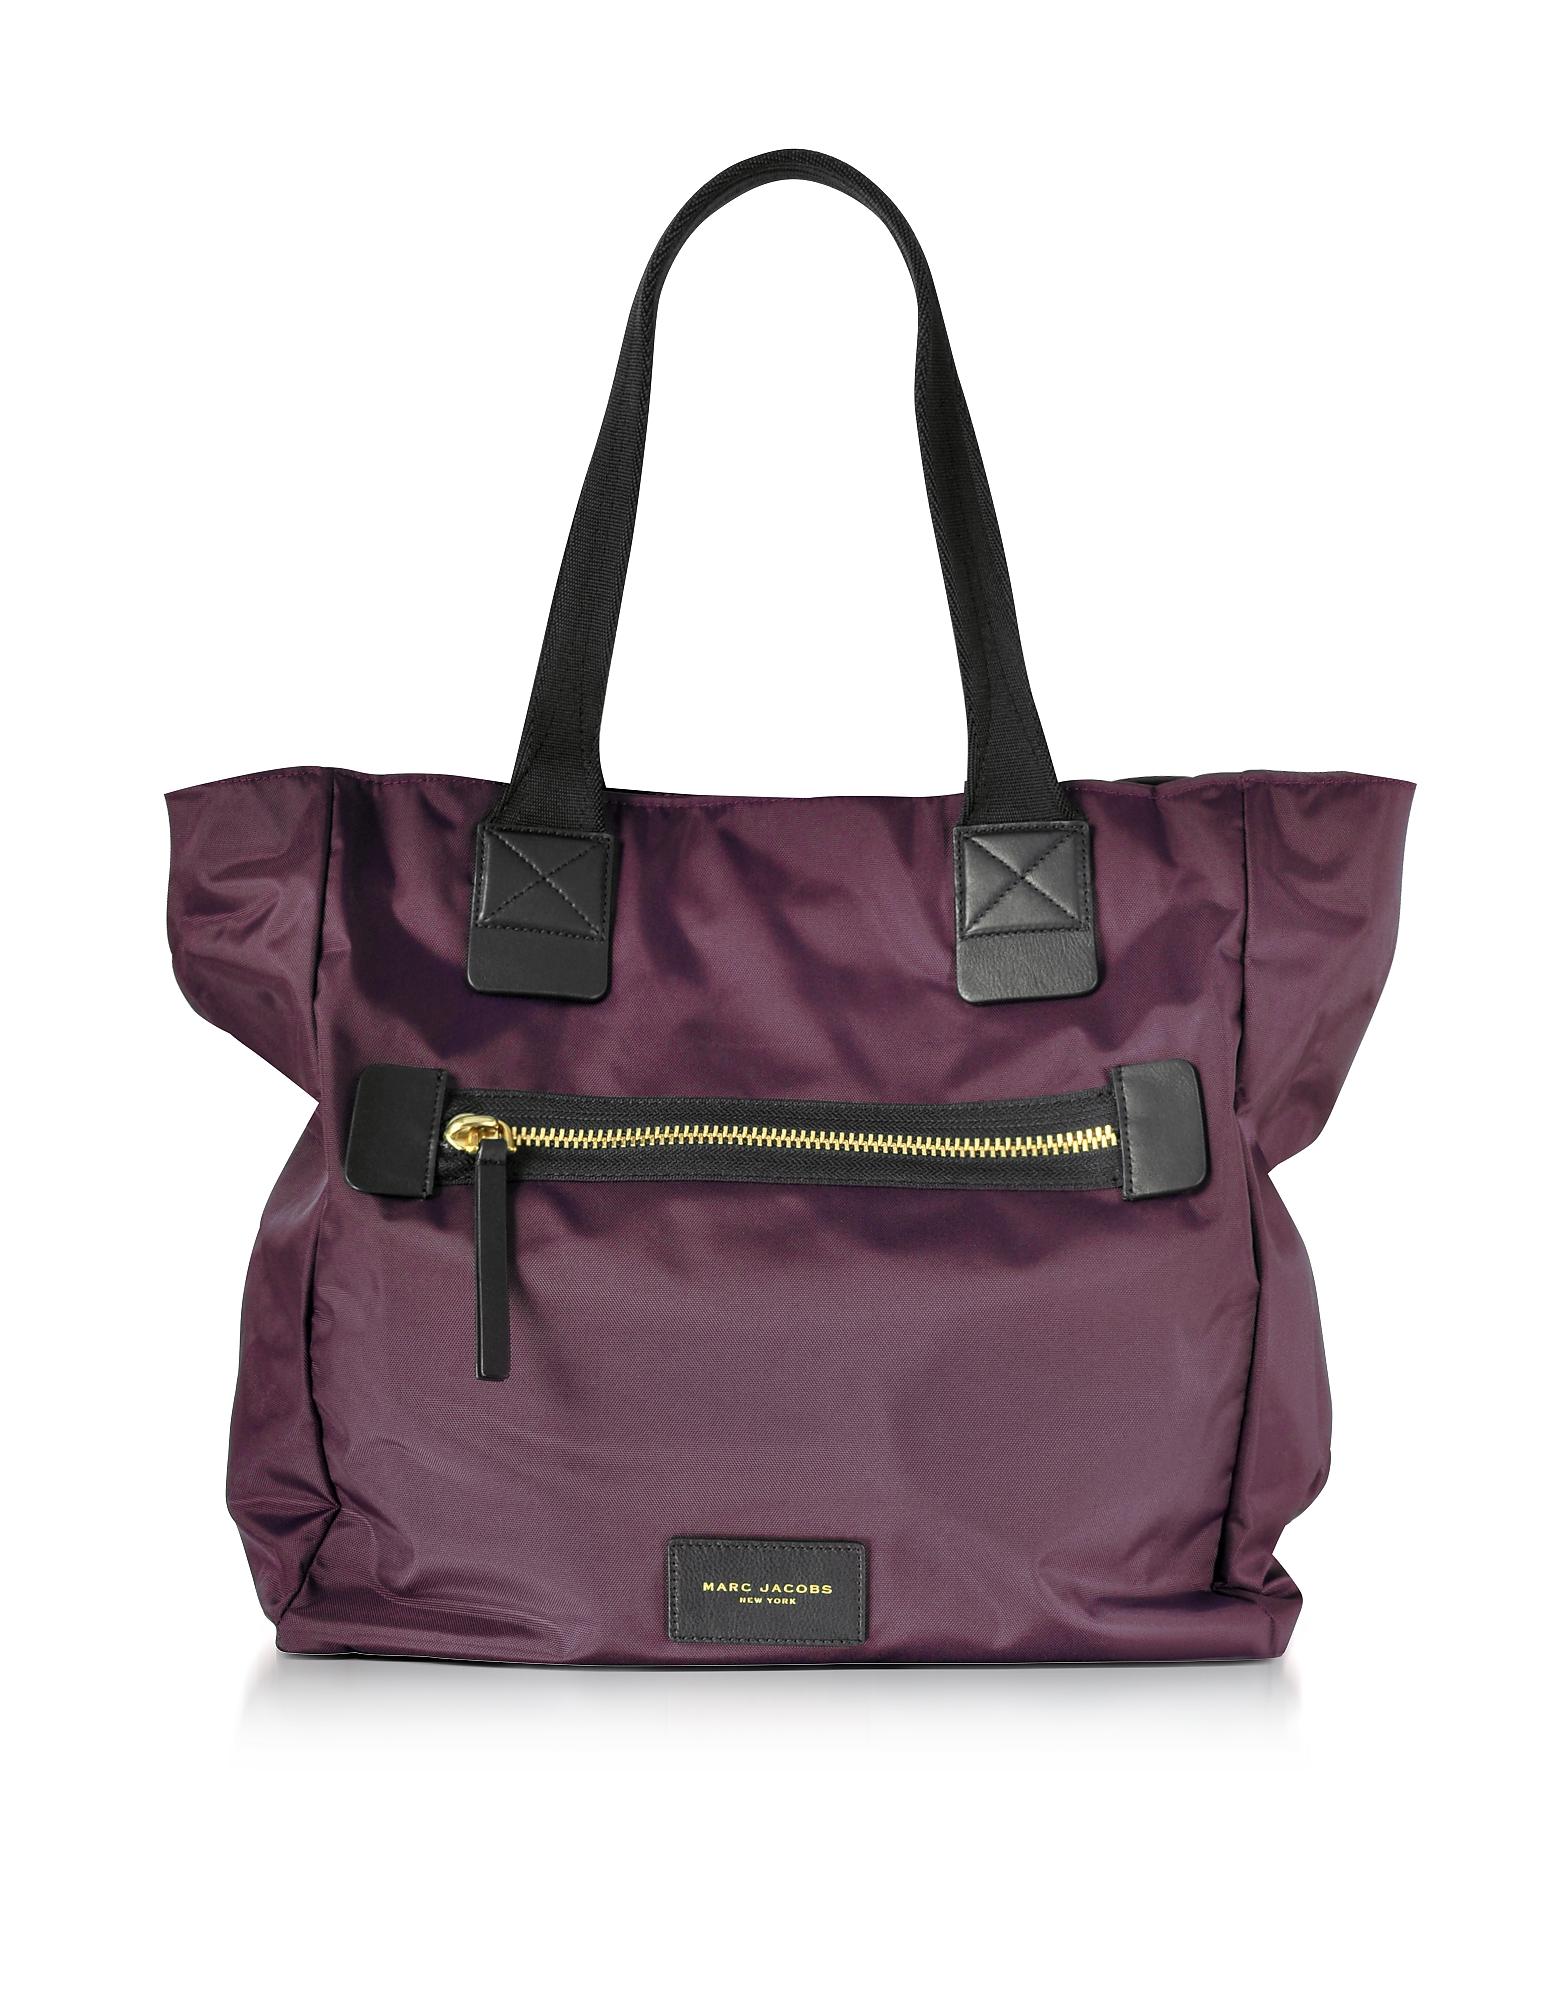 marc jacobs female marc jacobs designer handbags dark violet nylon biker ns tote bag